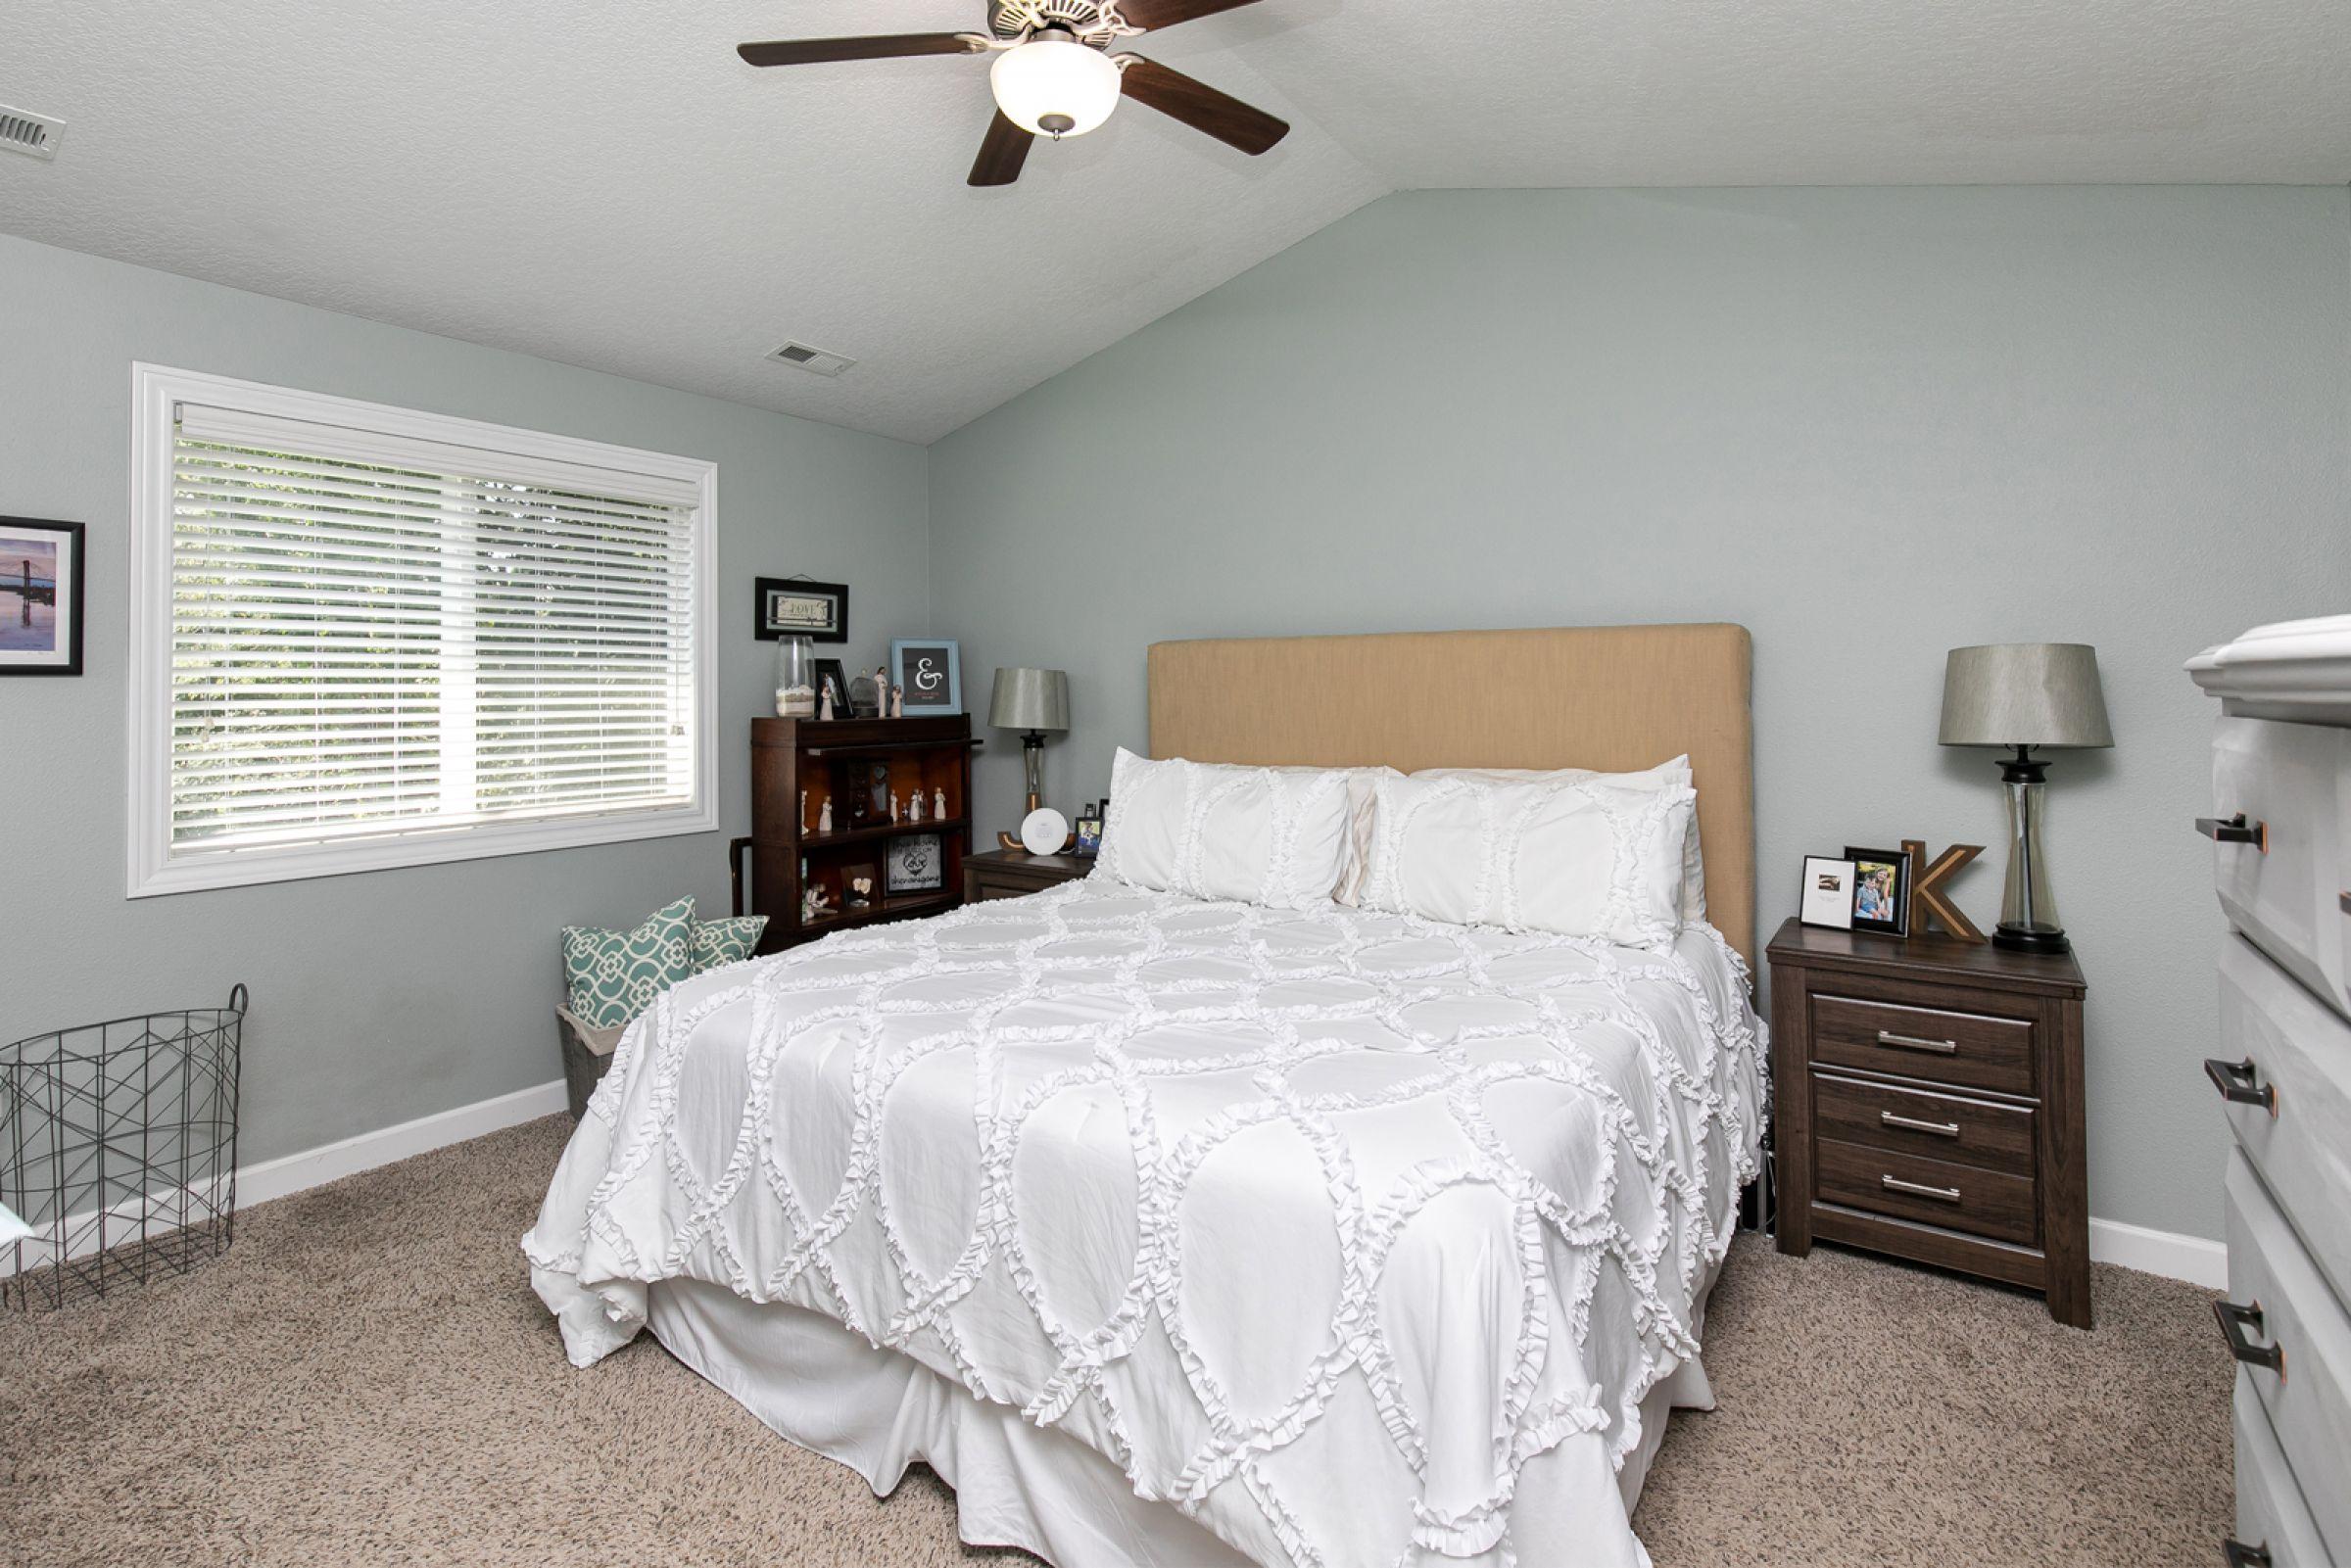 residential-warren-county-iowa-0-acres-listing-number-15685-5-2021-08-31-032418.jpg